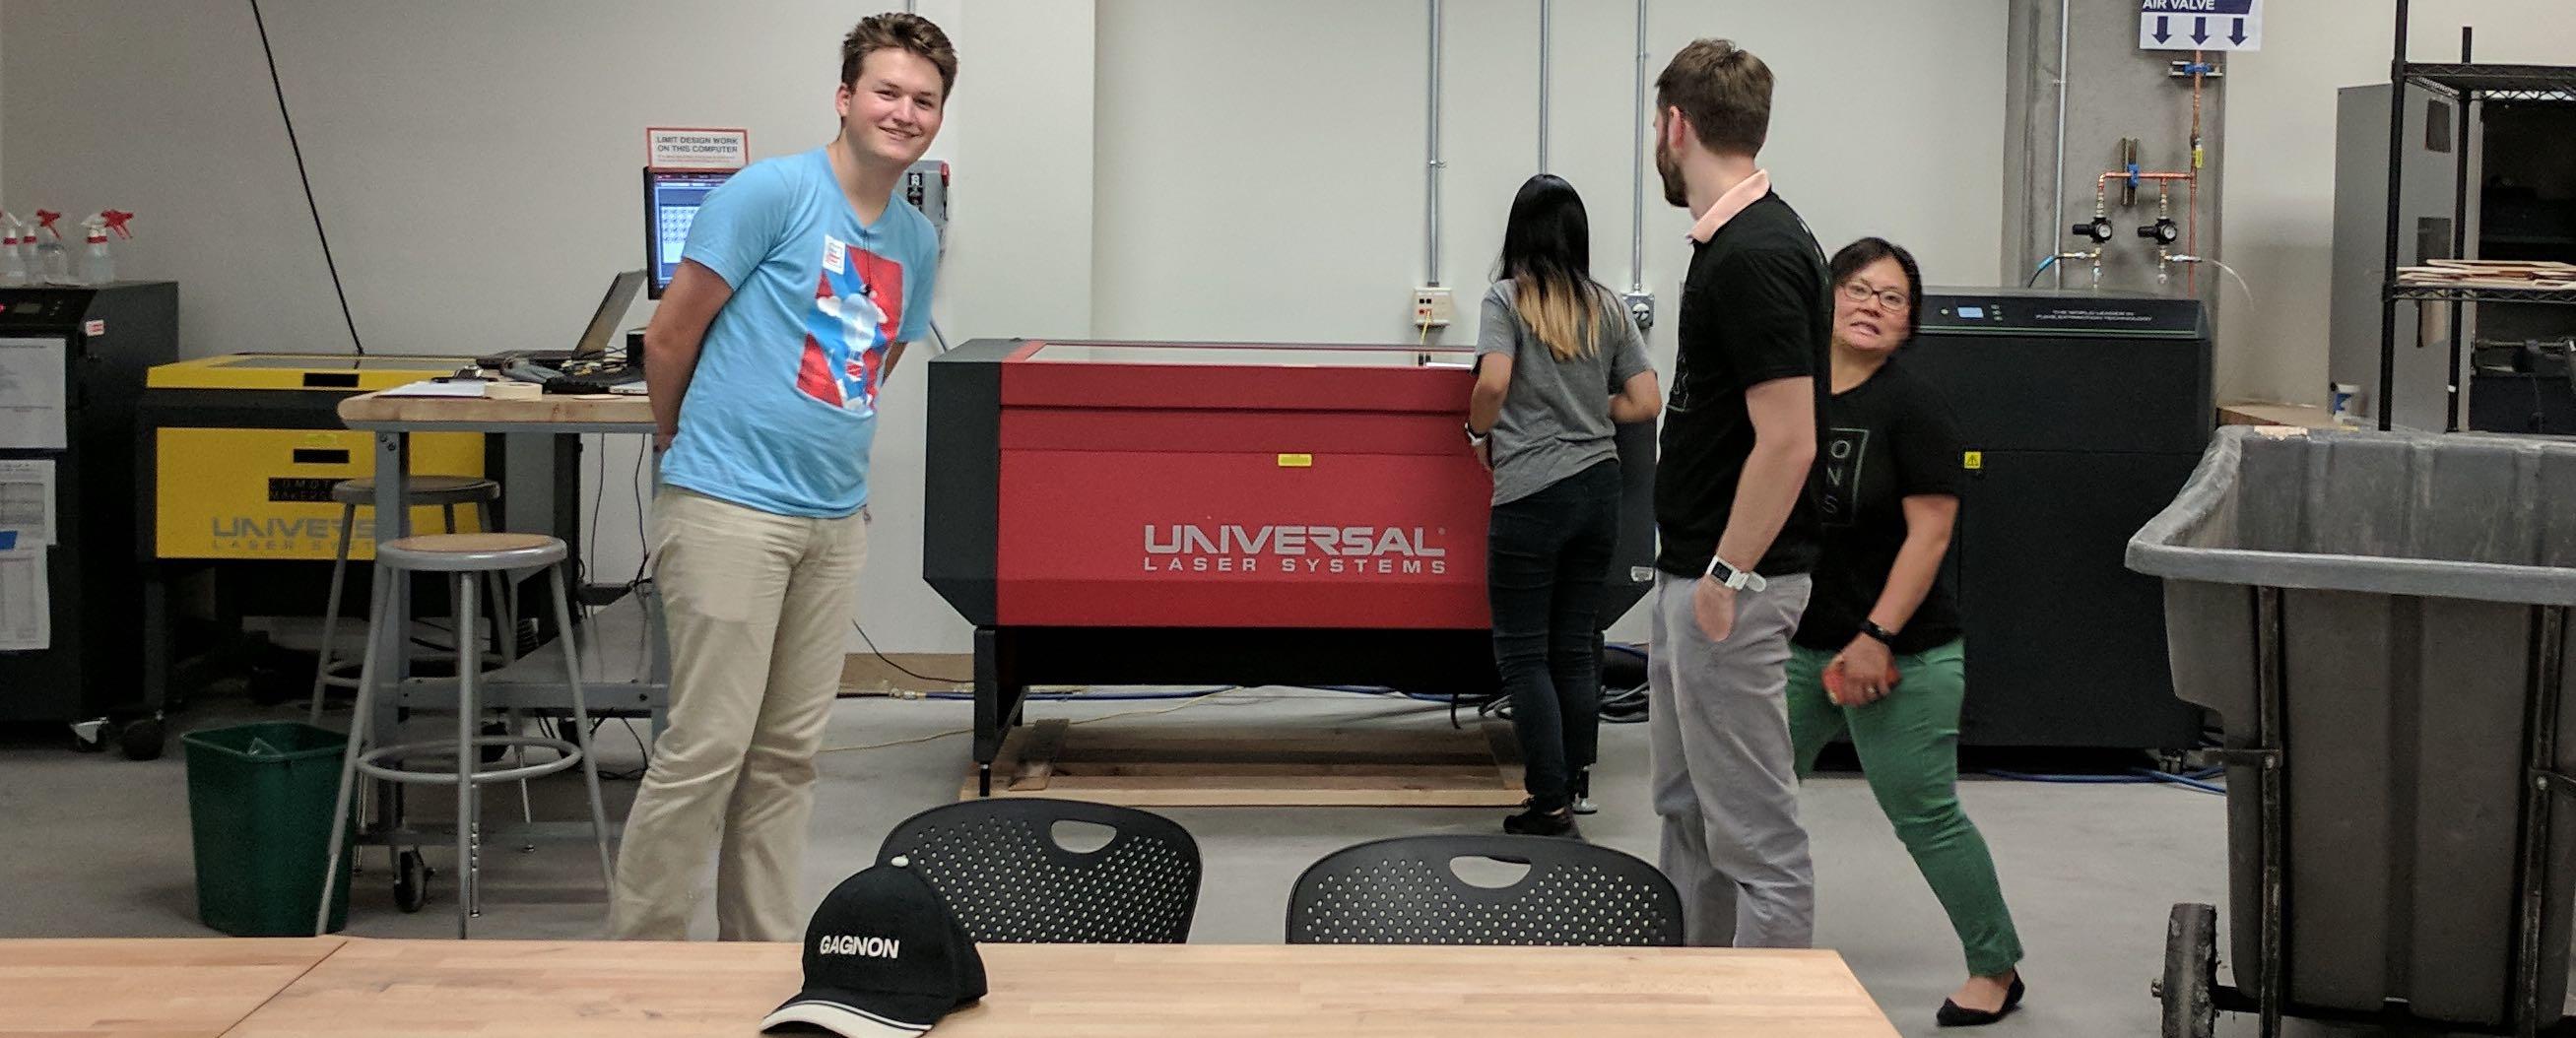 CoMotion MakerSpace big lasercutter!